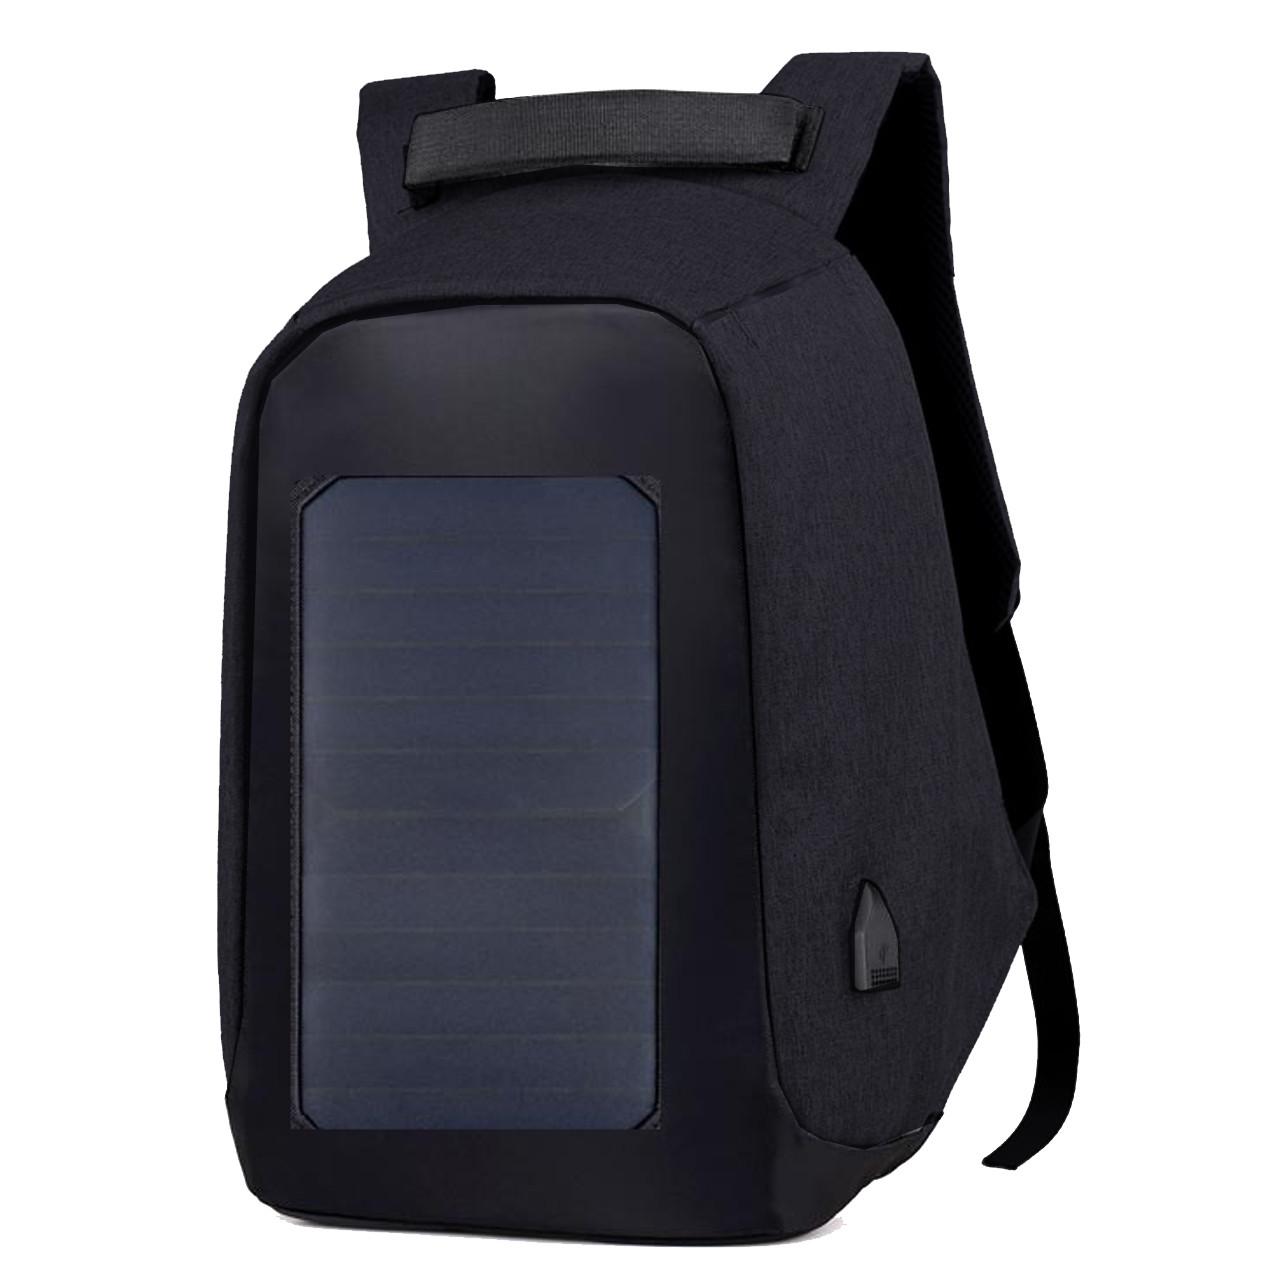 Рюкзак протикрадій Eceen ECE-681T з USB Black (3120-8663a)